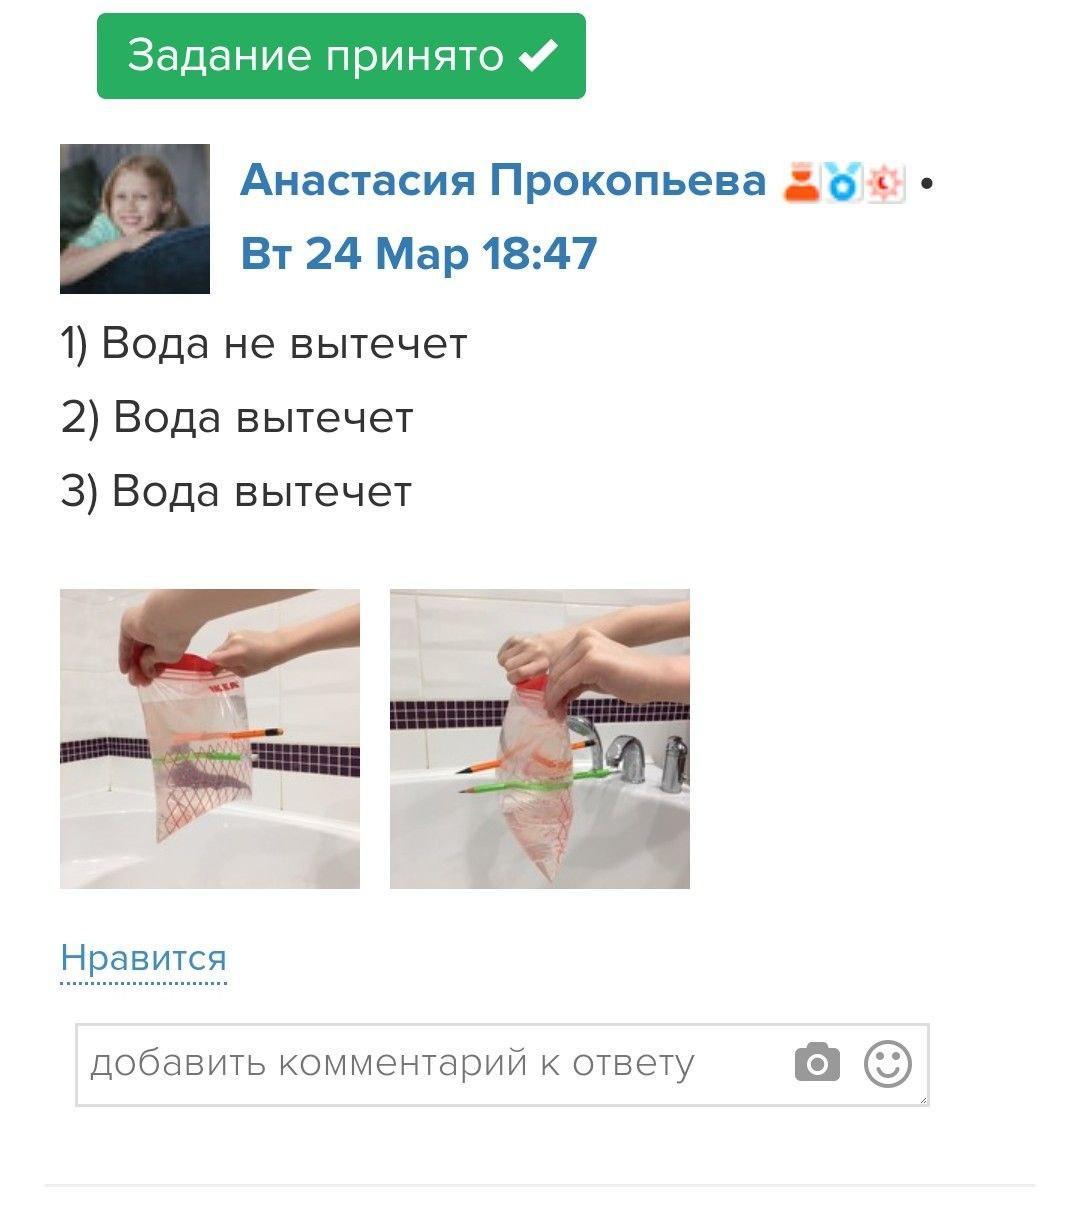 Пример задания на онлайн-курсе Систематики